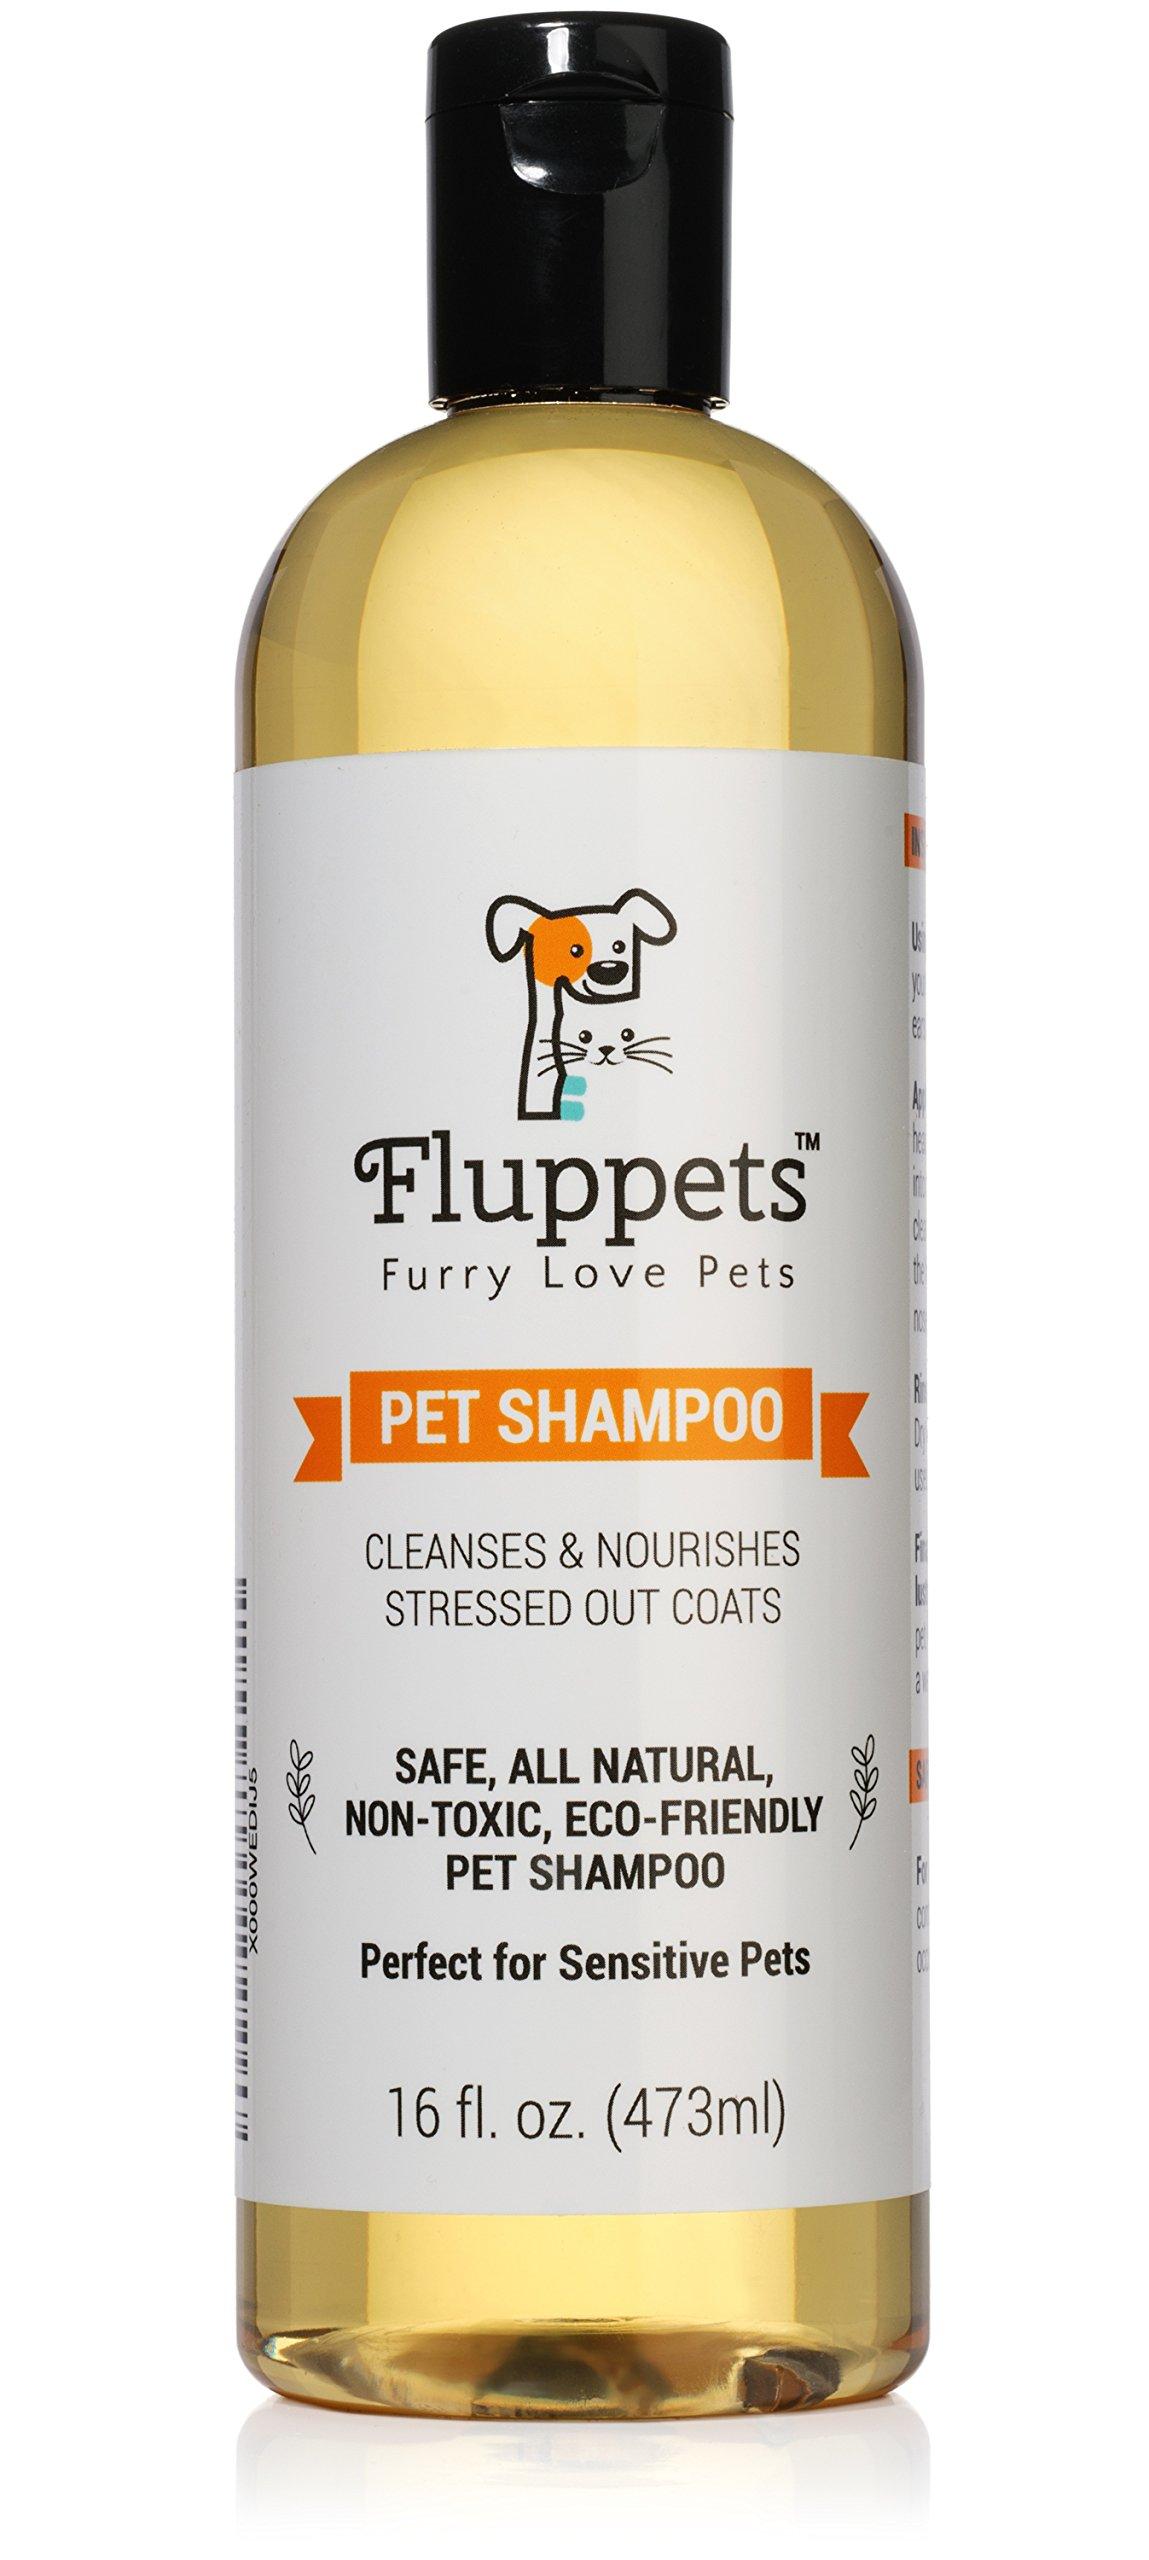 Fluppets Certified Organic Pet Shampoo, Hypoallergenic Non Toxic 1 Bottle 16oz